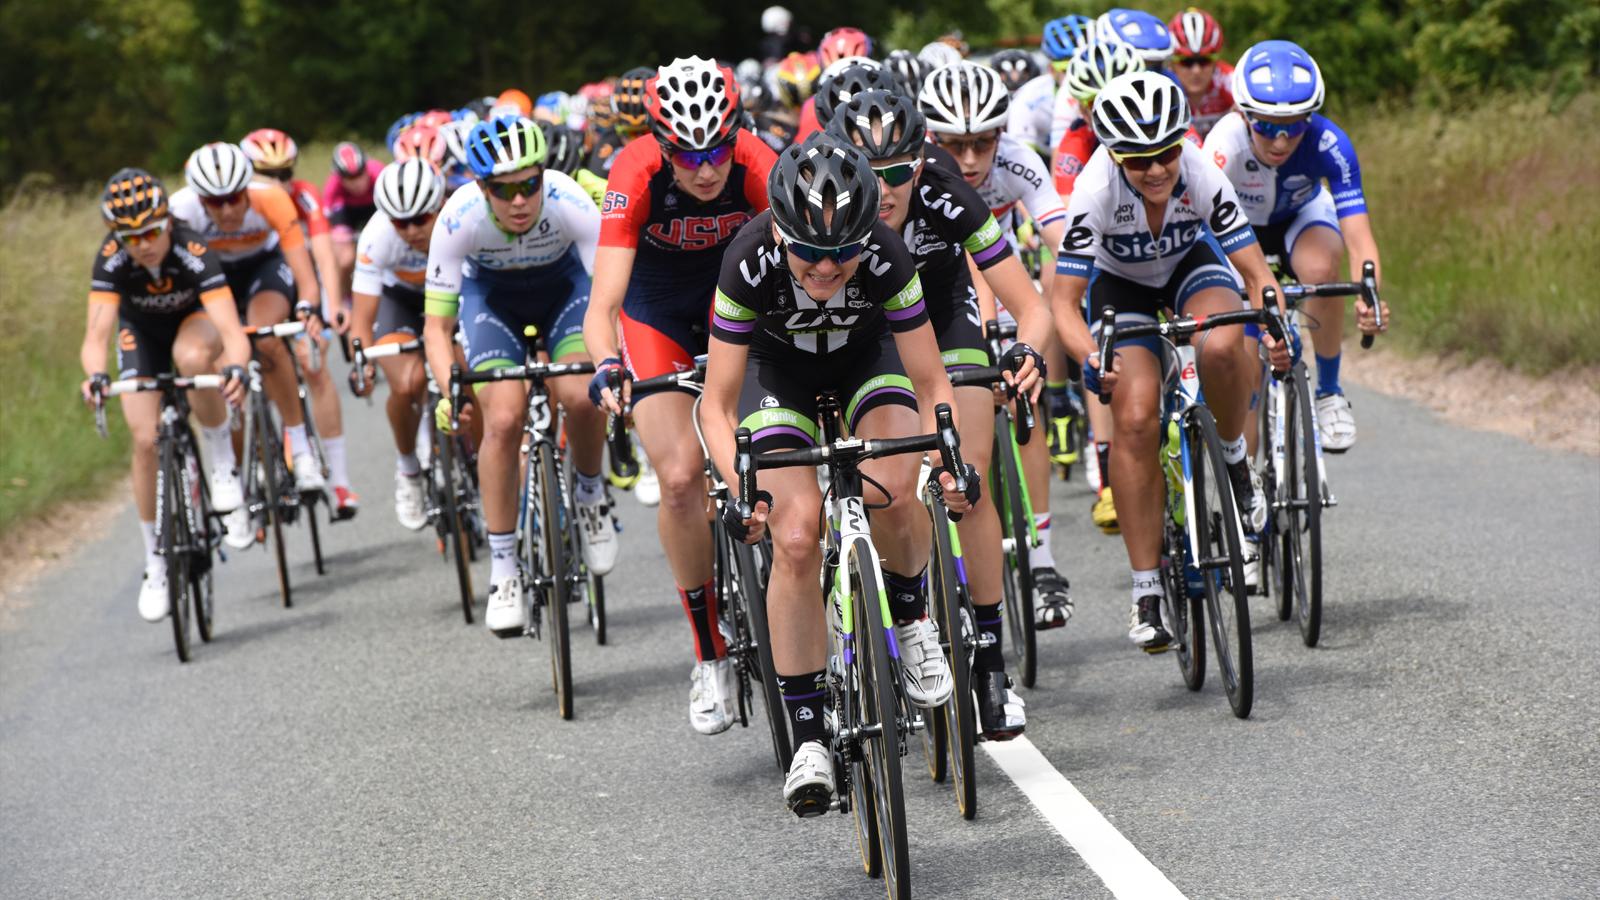 Sharon Laws 2015 Women's Tour peloton